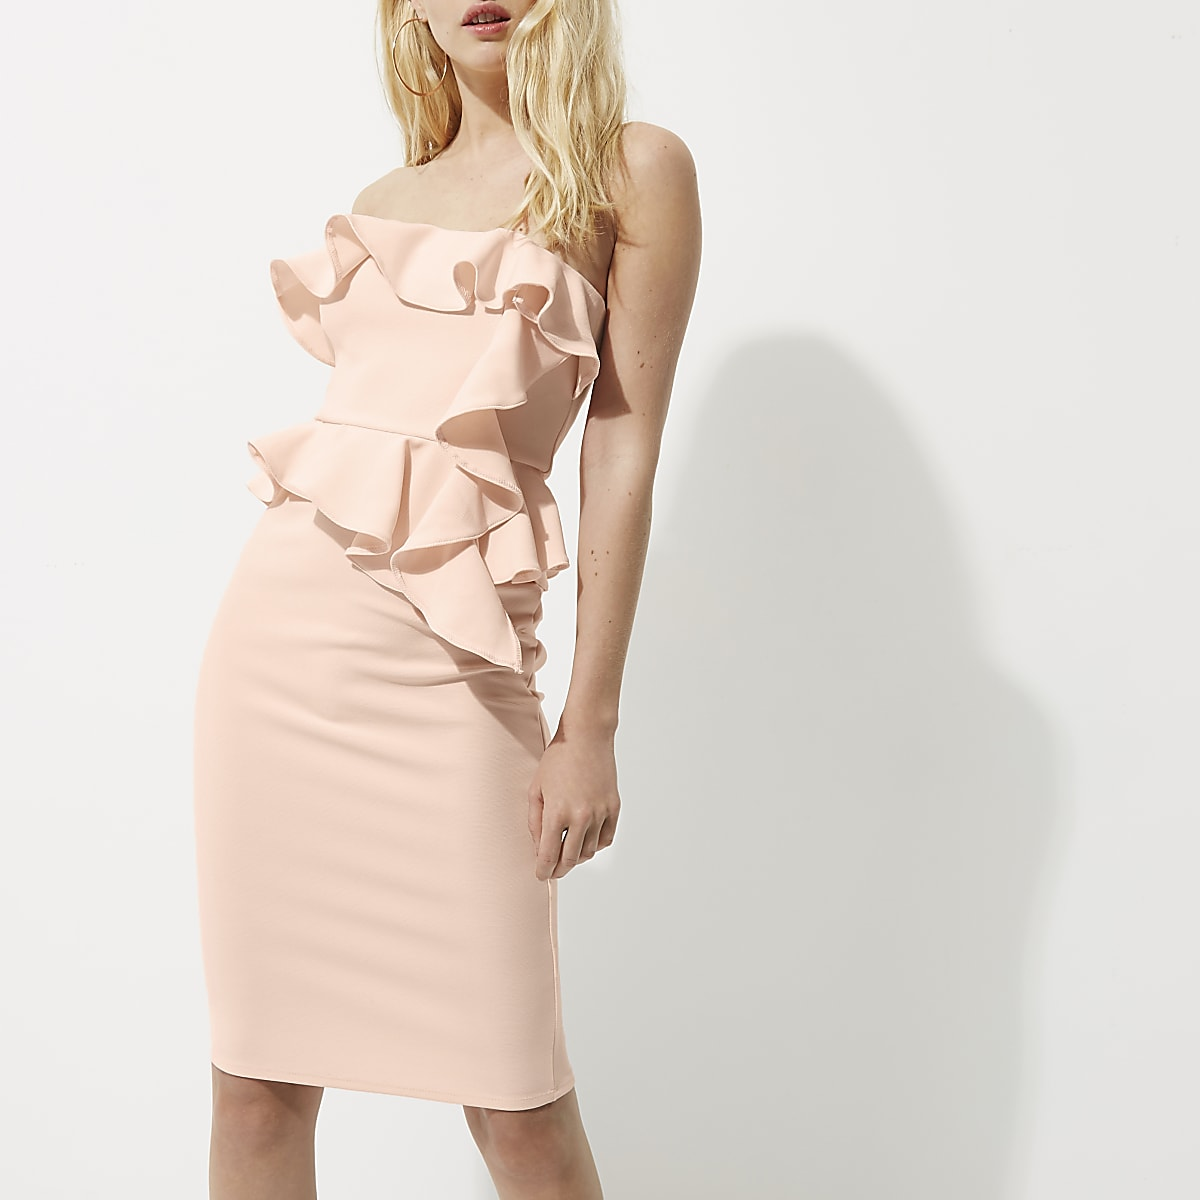 36b6f61920eb Light pink frill strapless bodycon dress - Bodycon Dresses - Dresses ...